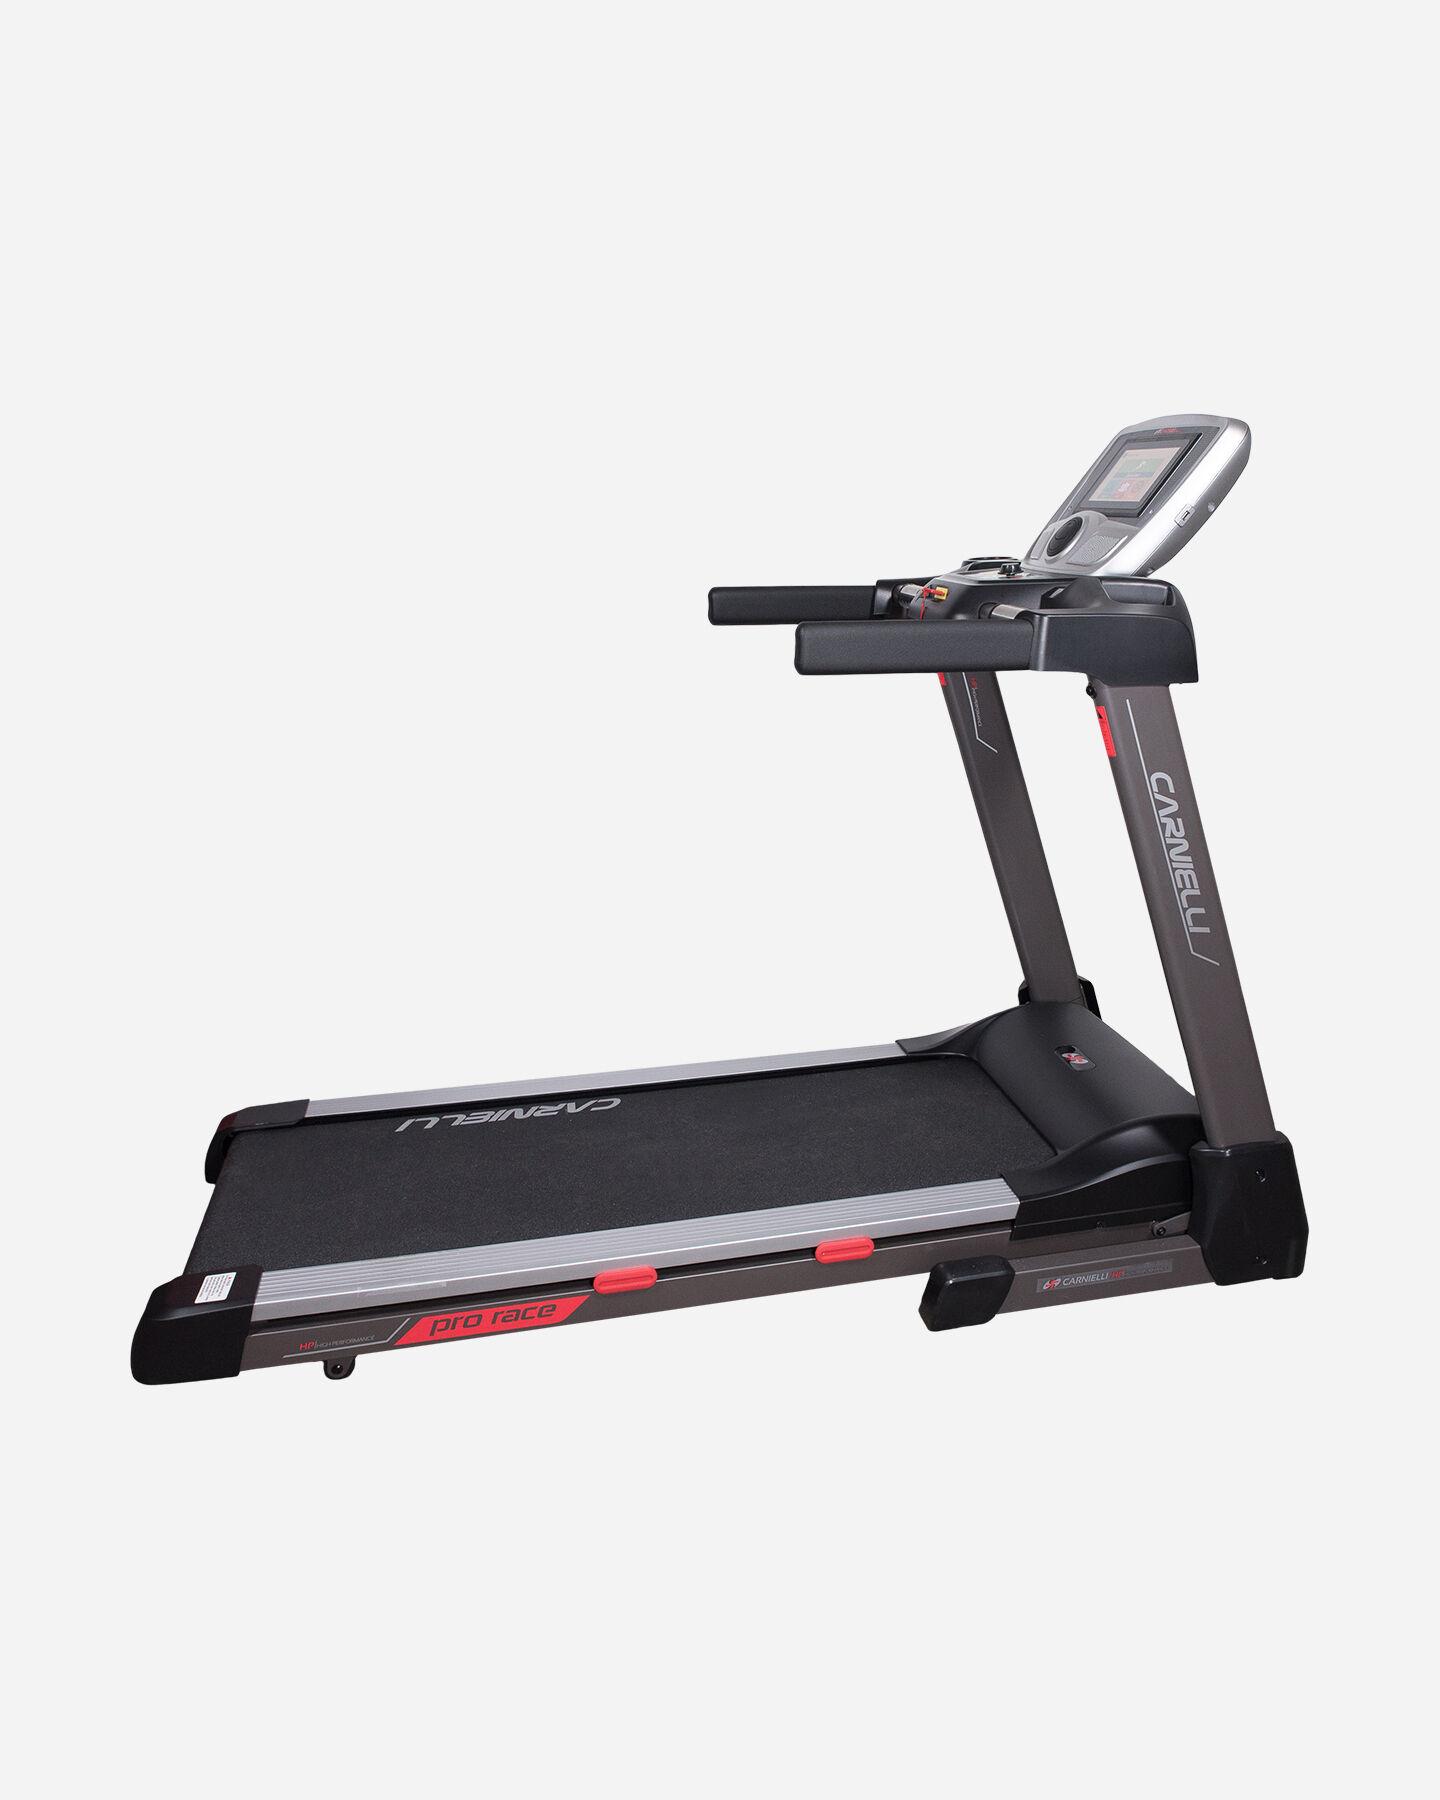 Tapis roulant CARNIELLI HP PRO RACE S4007099|GEN|UNI scatto 0